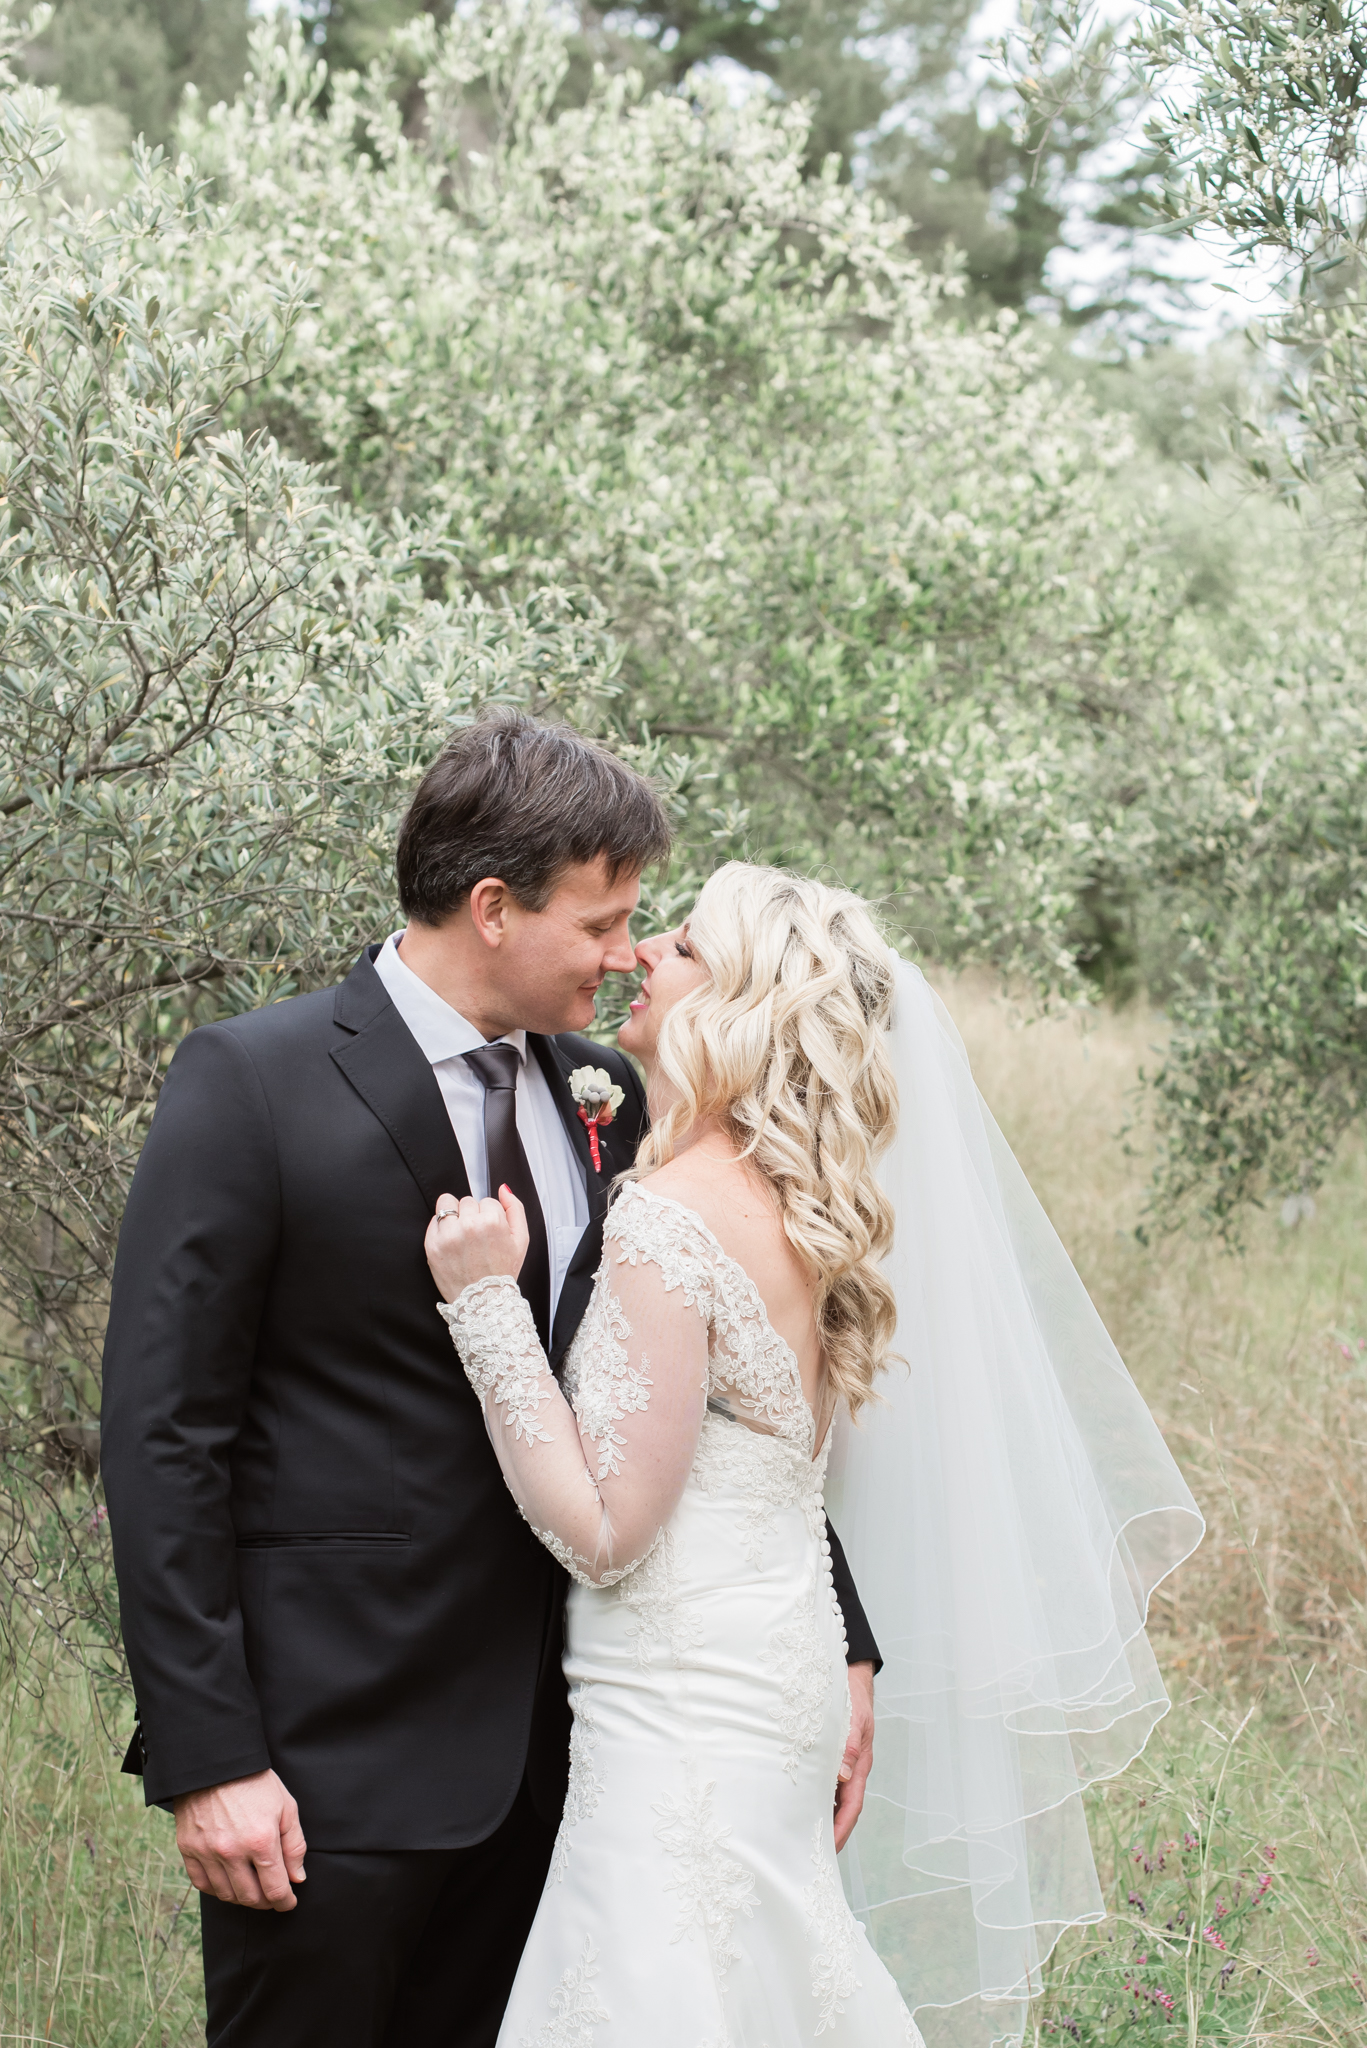 Angelique_Smith_Photography_Pieter&Yvonne_Wedding-385.jpg